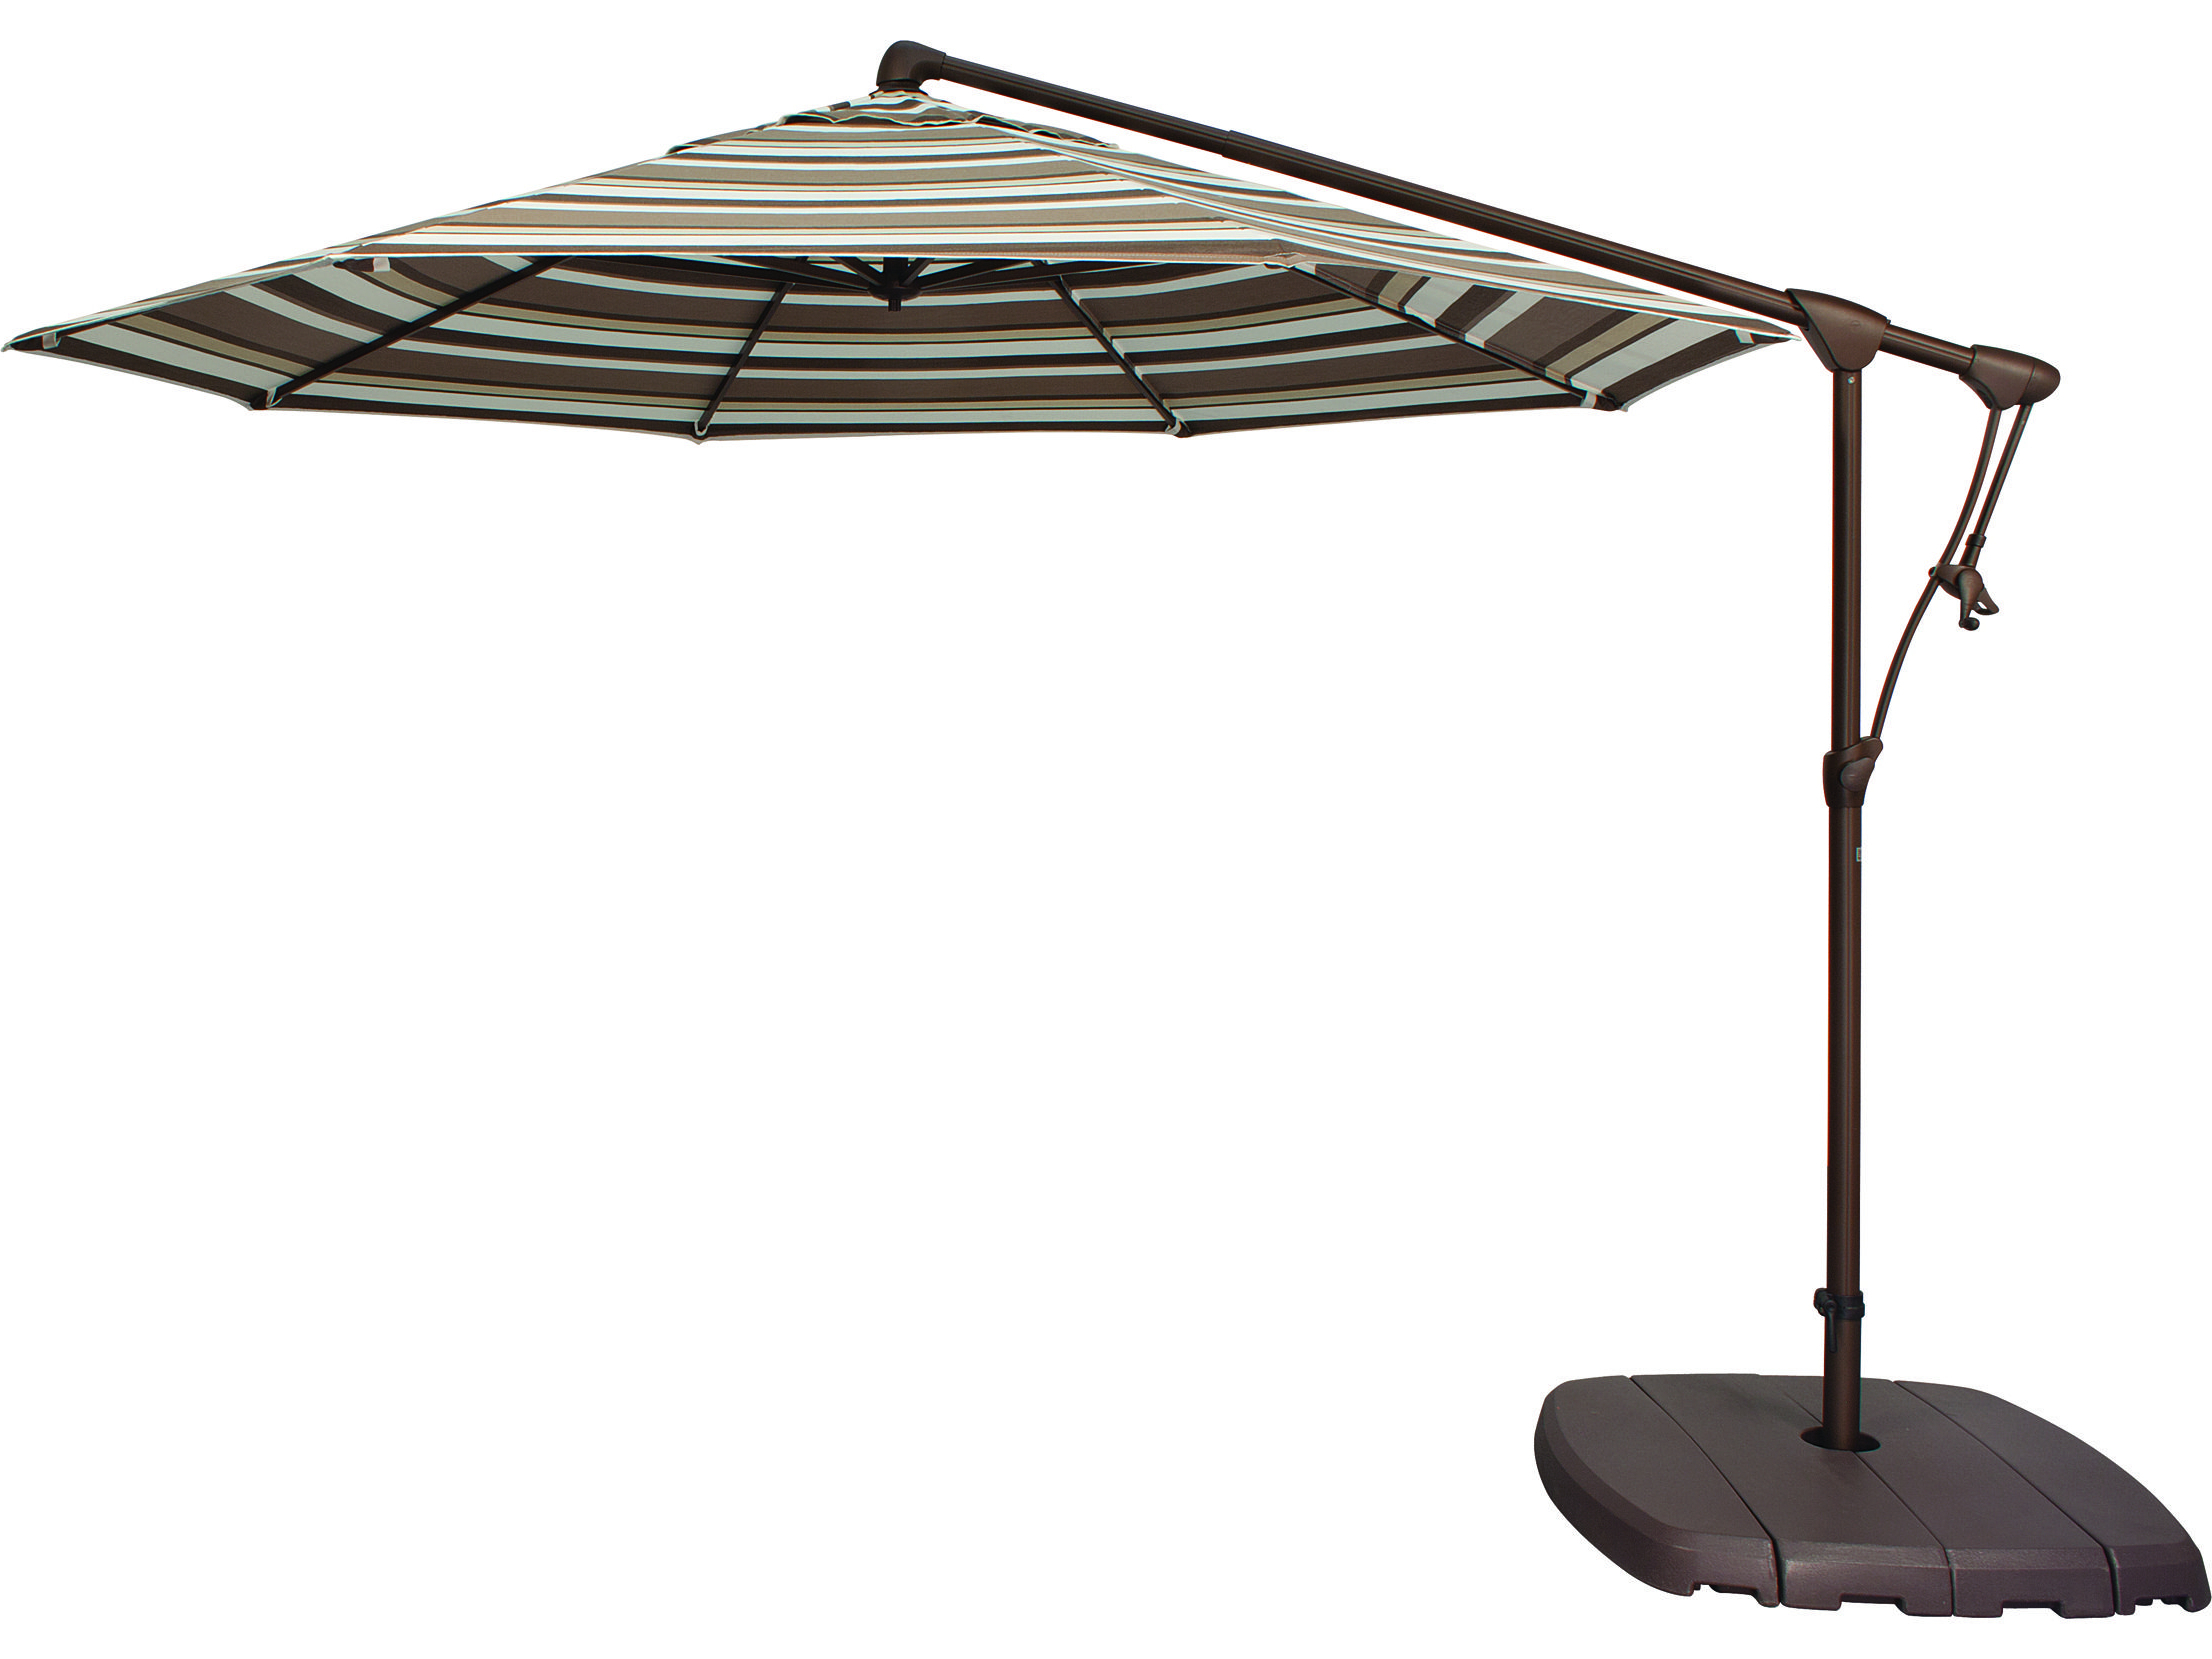 Current Treasure Garden Cantilever Ag19 Aluminum 10' Octagon Tilt & Lock Intended For Voss Cantilever Sunbrella Umbrellas (View 3 of 20)